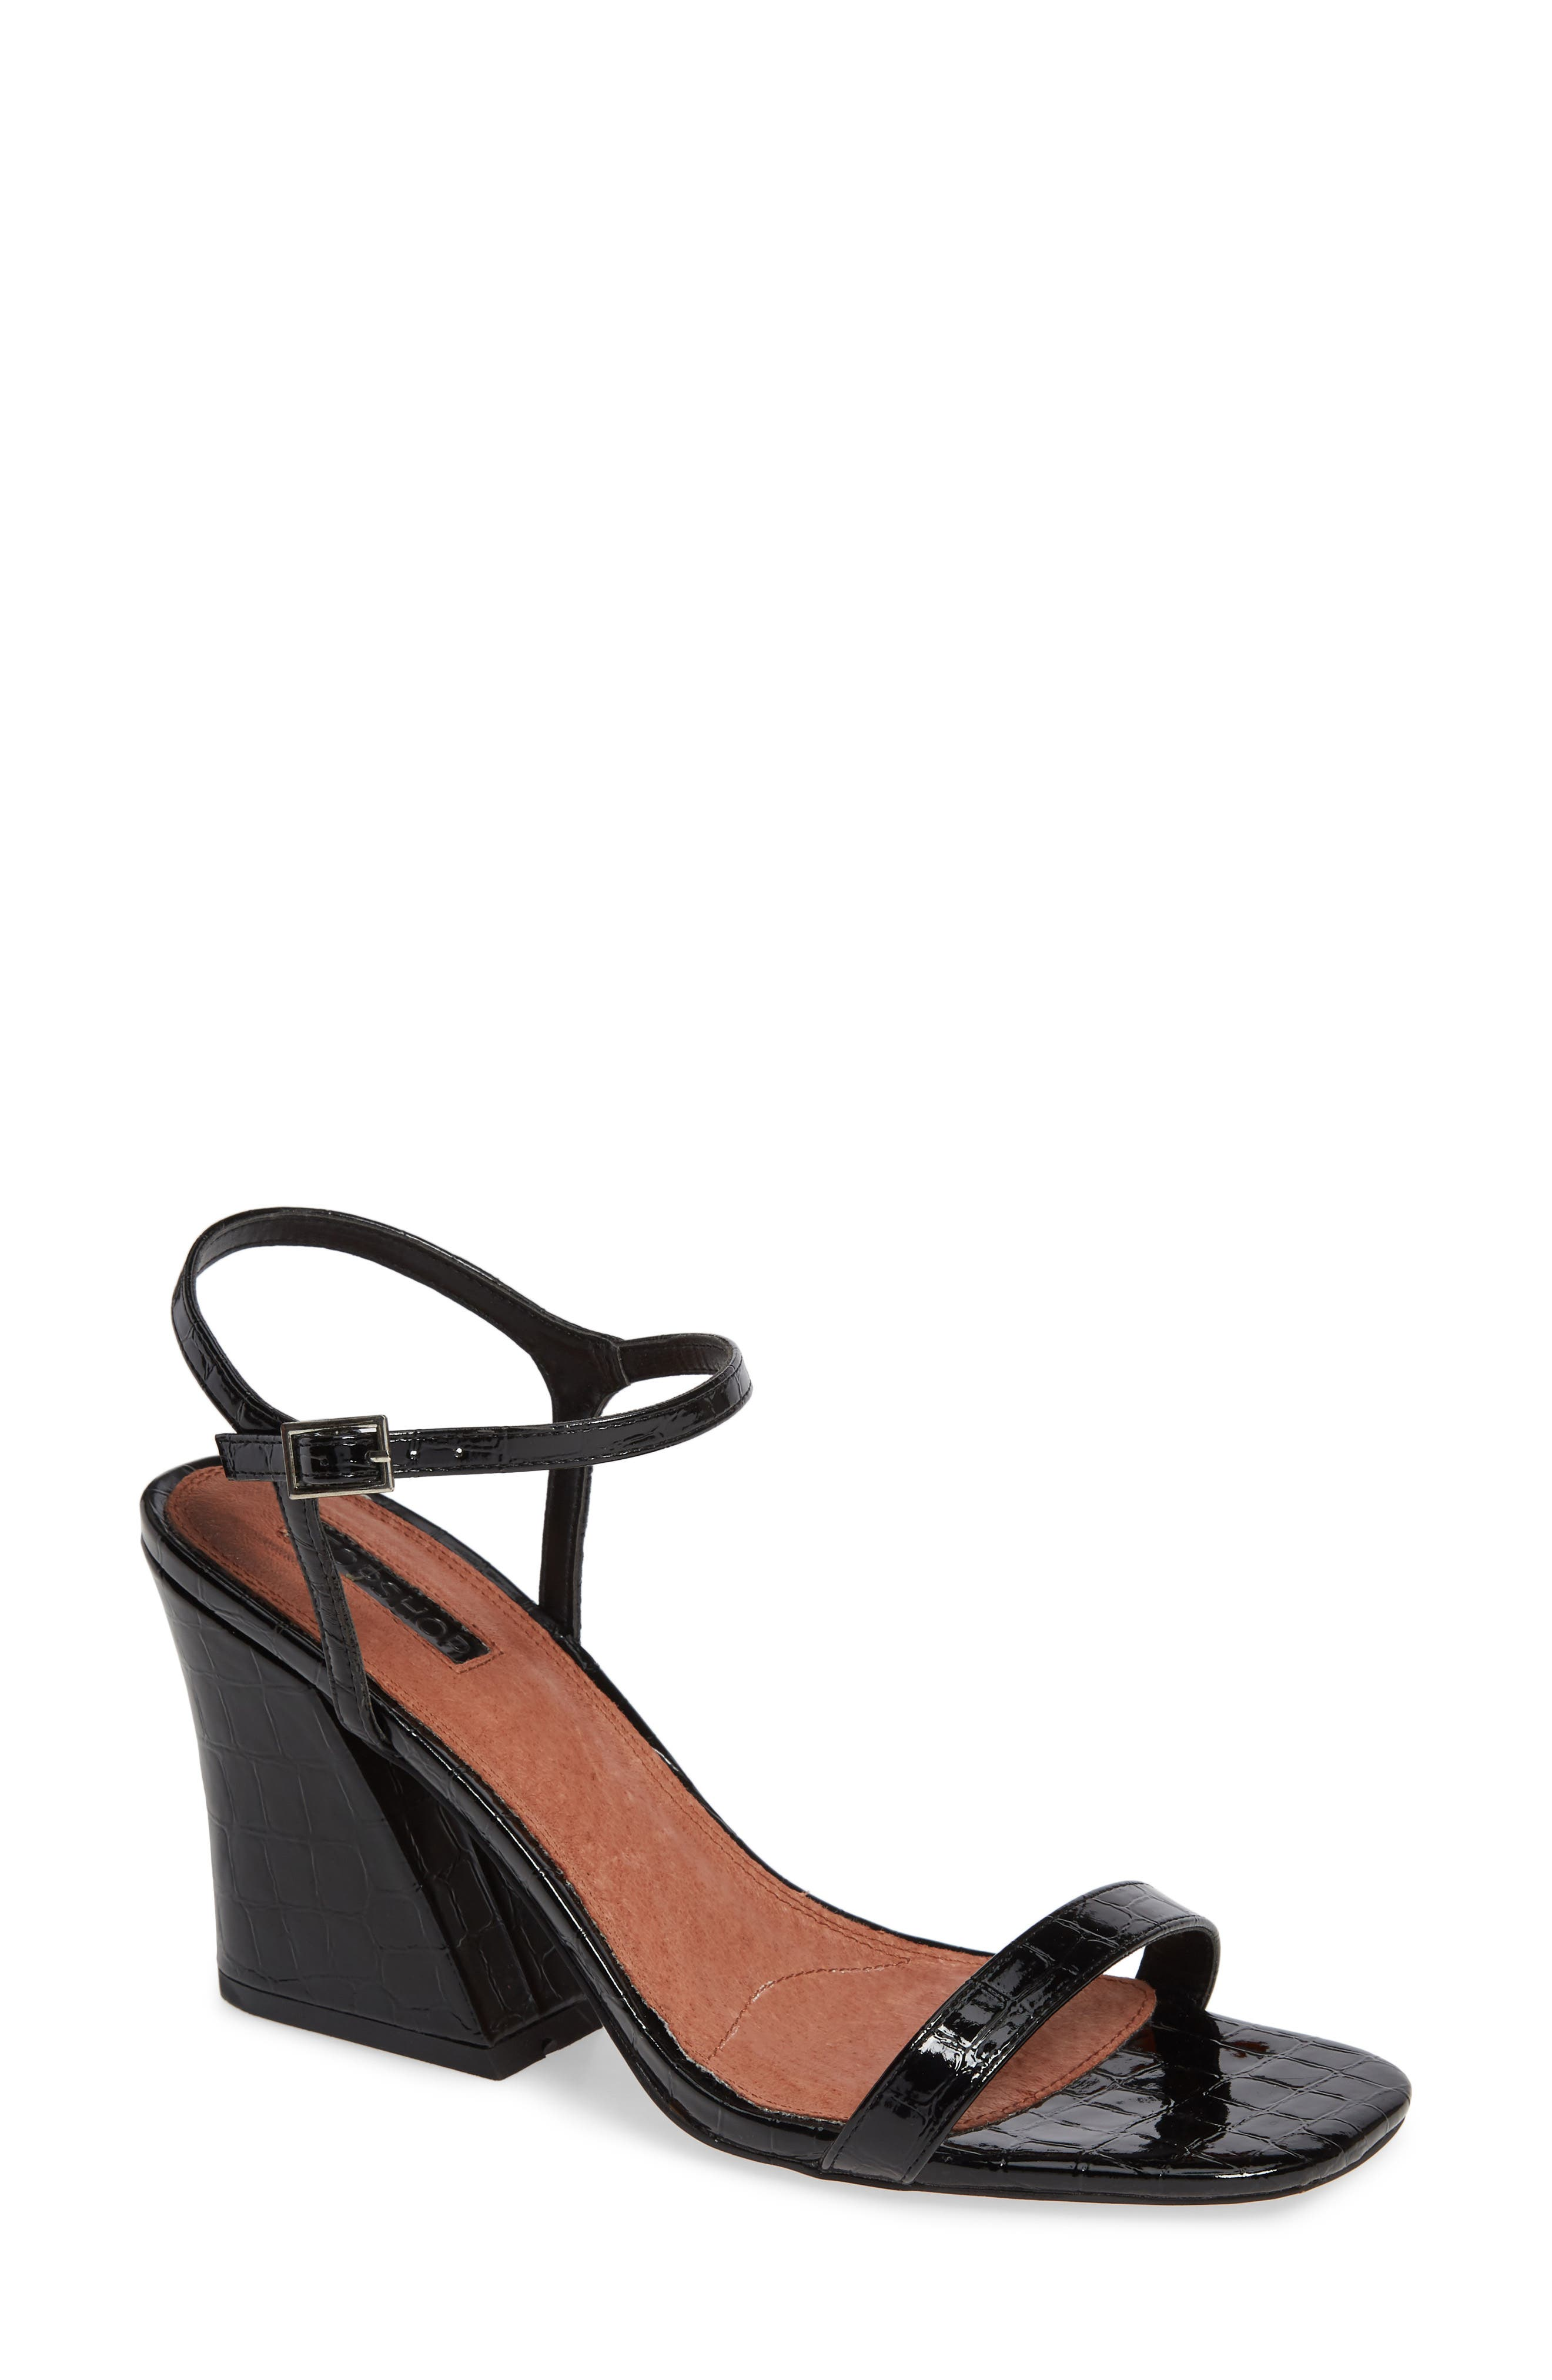 Remy Block Heel Sandal by Topshop